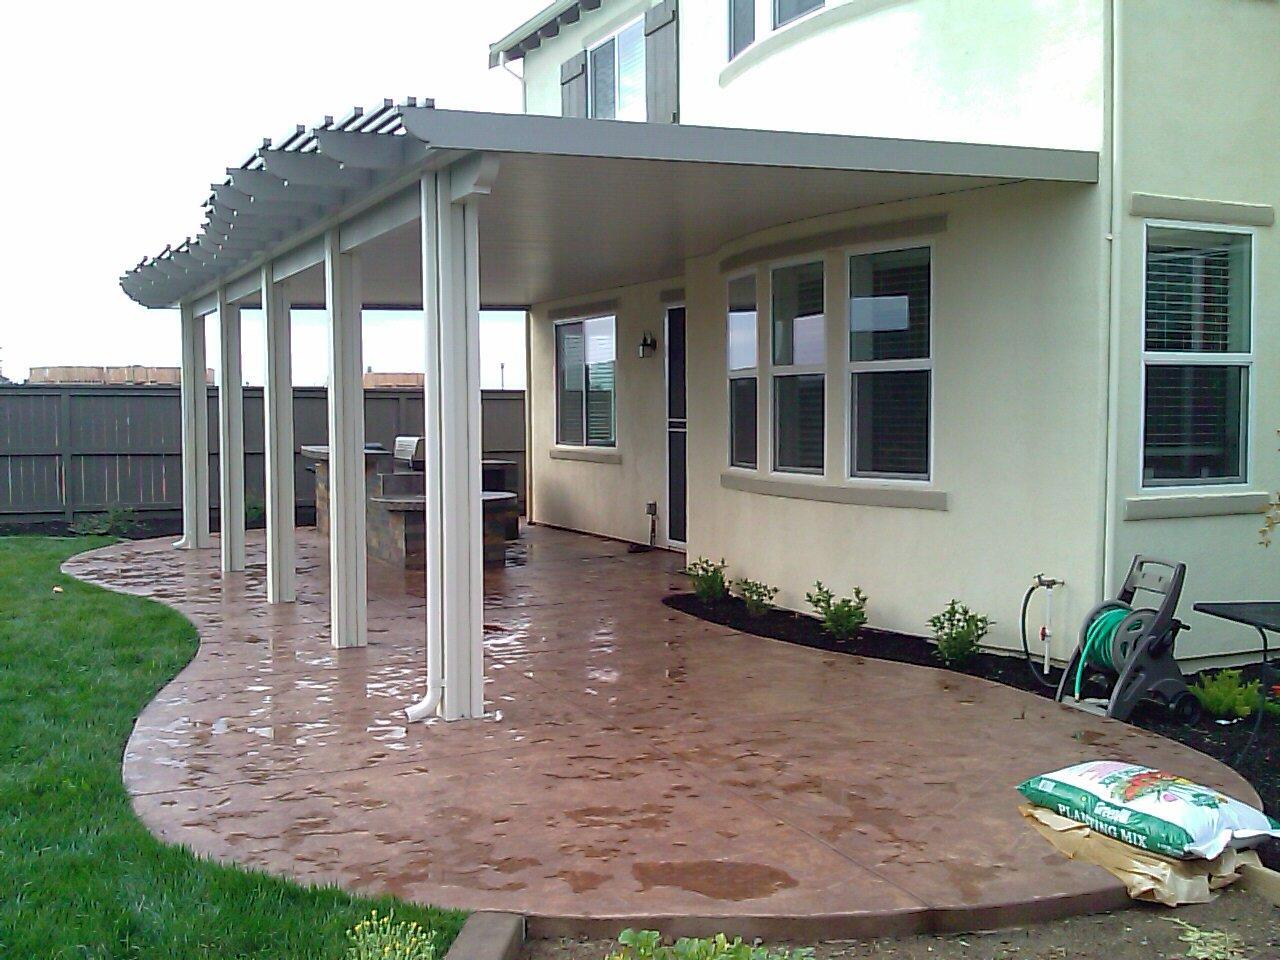 aluminum solid patio covers in sacramento | sacramento patio covers -  contractors, FGSREEY